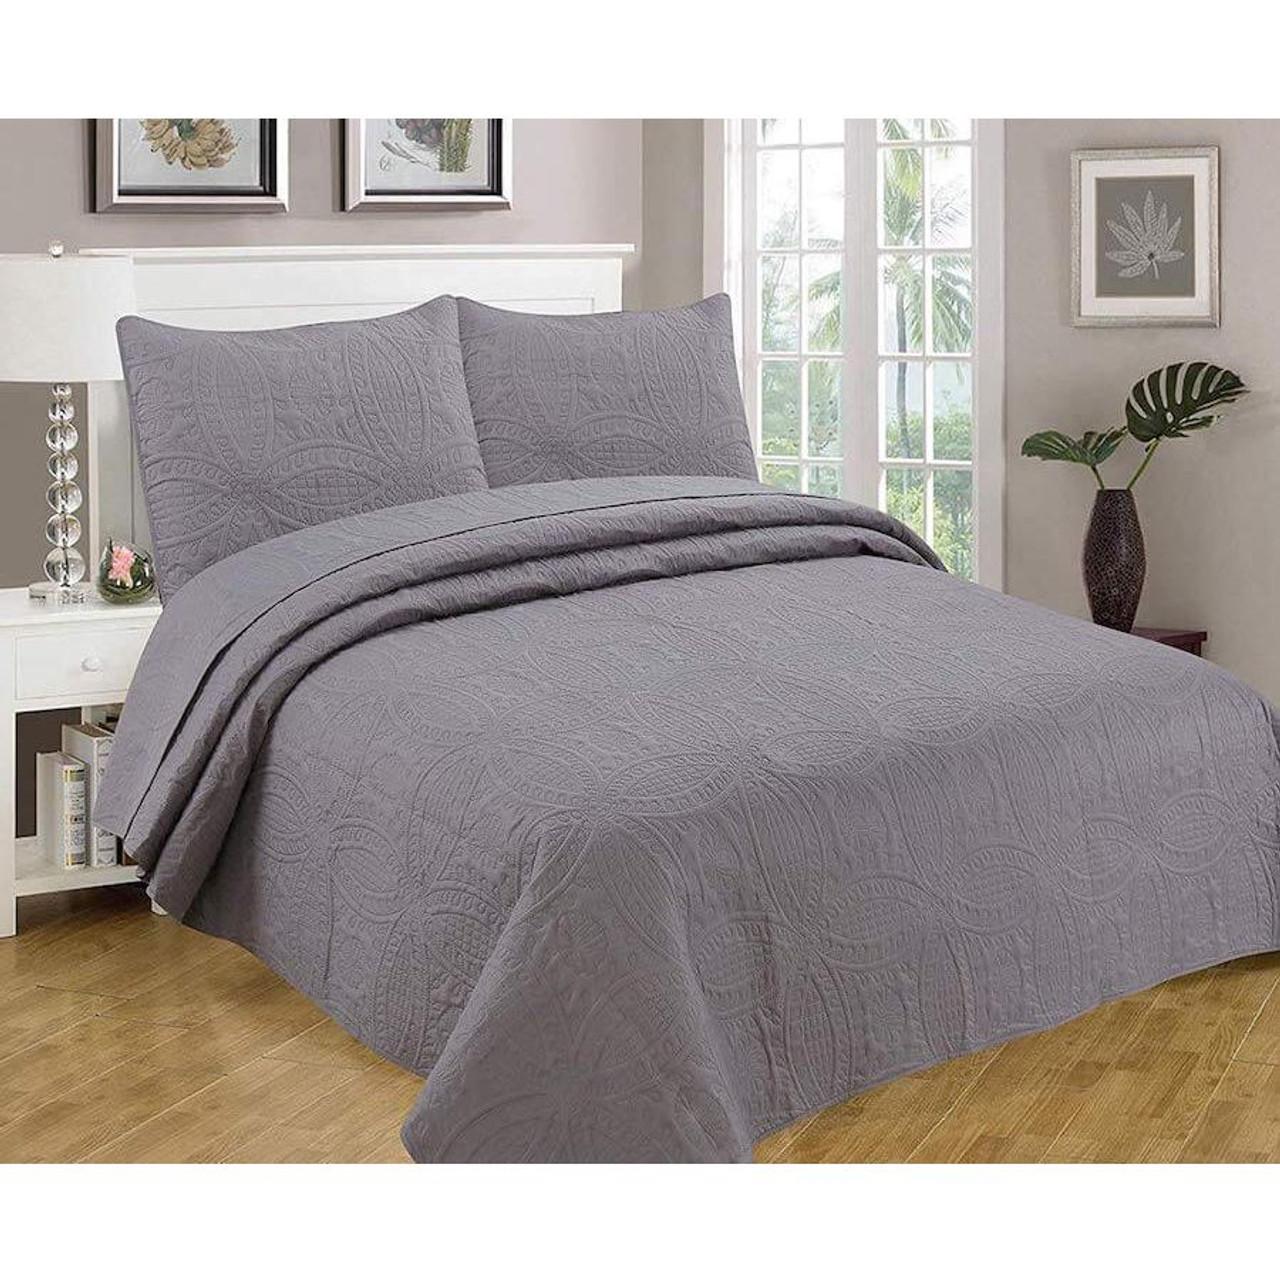 3 Pc Oversized Bedspread Coverlet Set Charcoal Color in USA, California, New York, New York City, Los Angeles, San Francisco, Pennsylvania, Washington DC, Virginia, Maryland